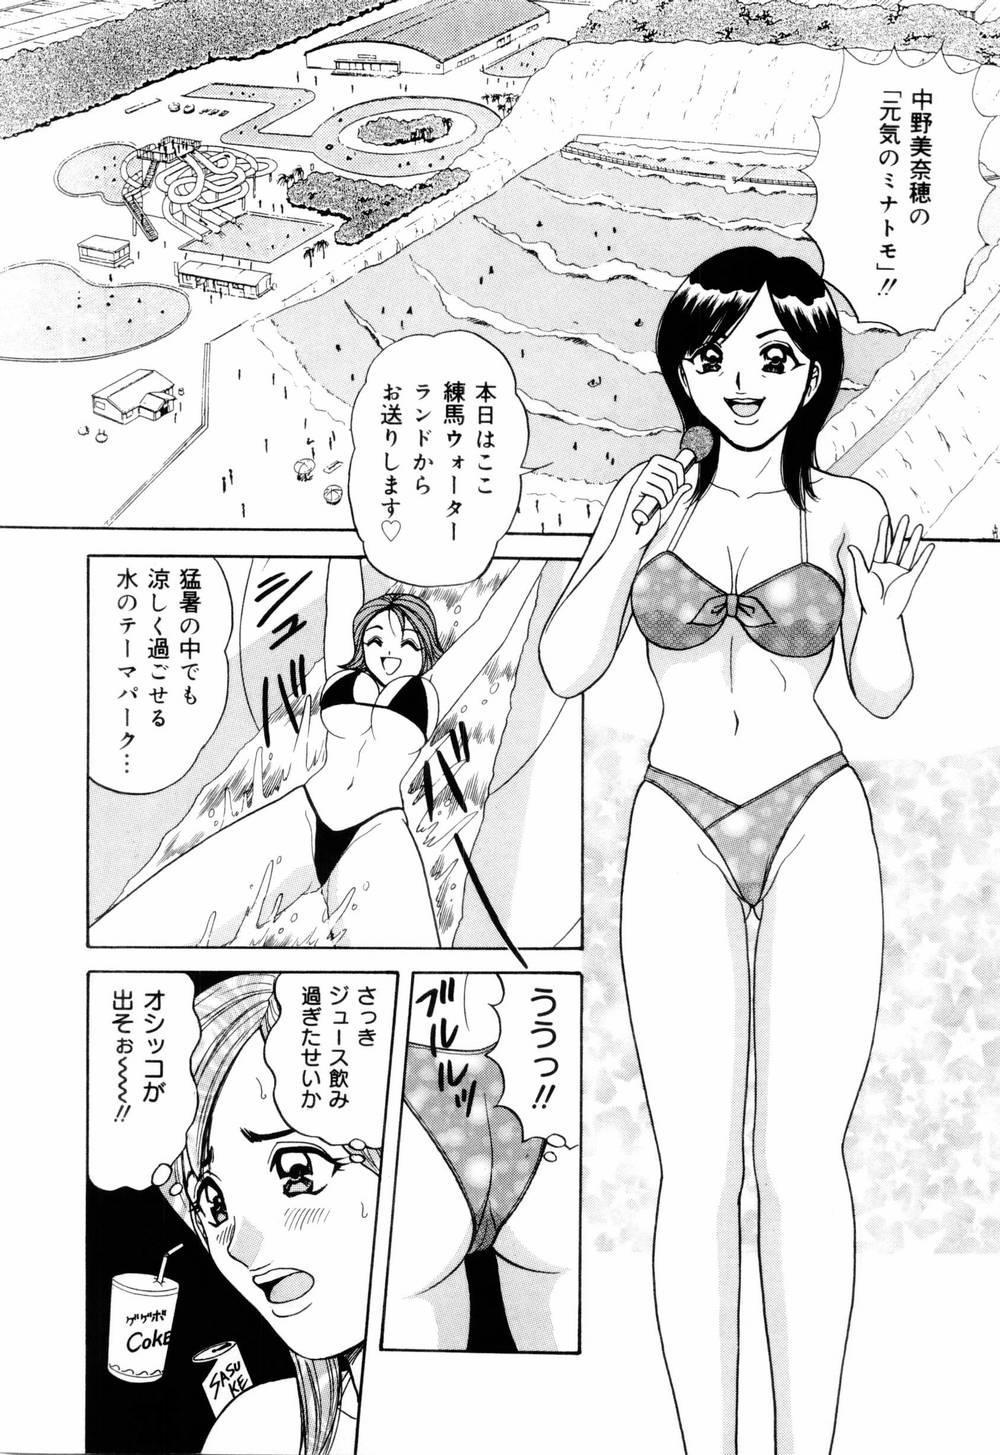 SuiCup Joshi Announcer Jikkyo Chukei Rape 125